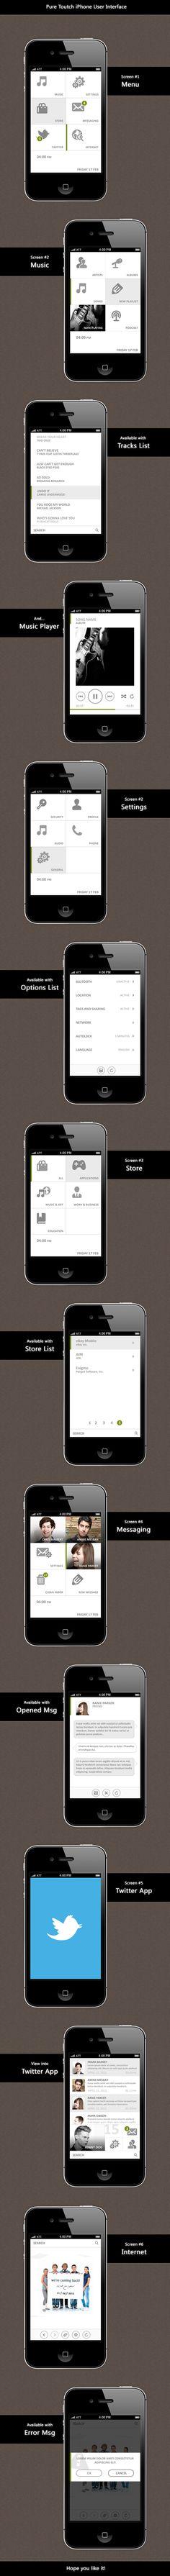 Pure Toutch iPhone User Interface